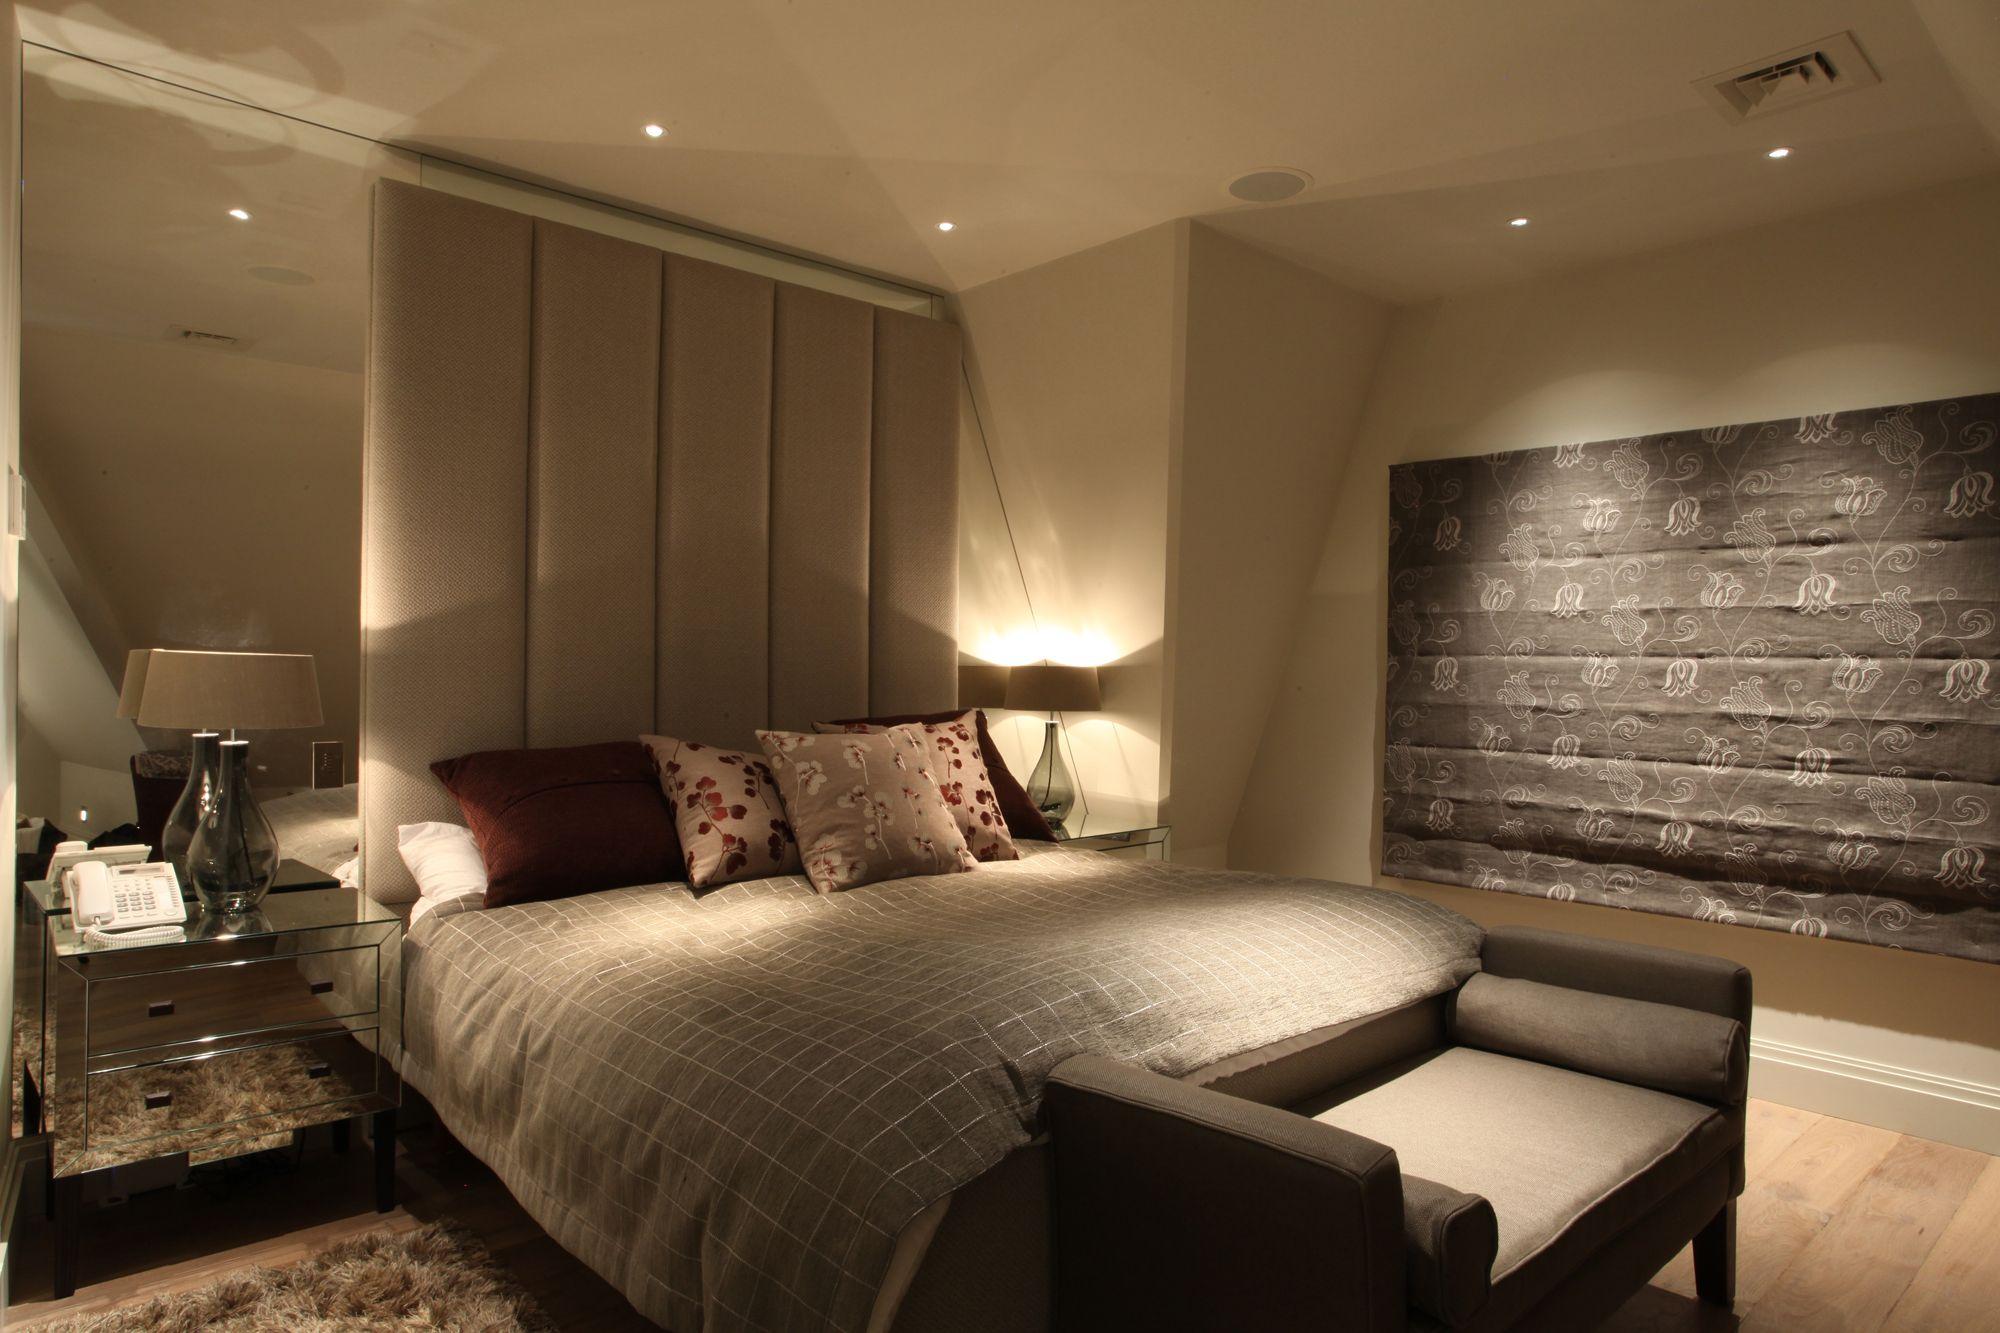 Lighting Bedroom Bedroom Lighting Bedroom Lighting I Houseofphonicscom